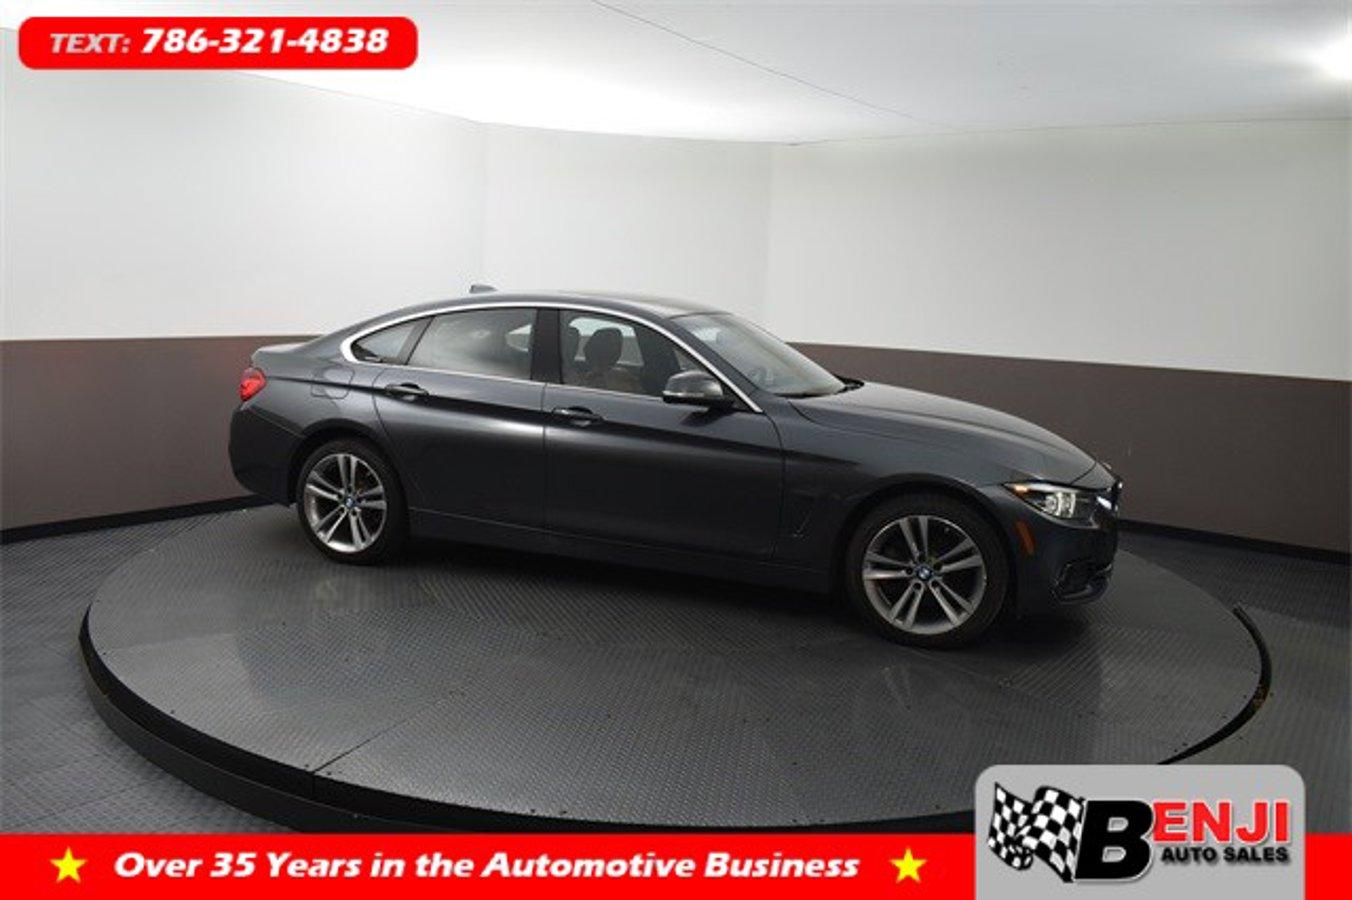 Used BMW 4-SERIES 2018 BROWARD 430I XDRIVE